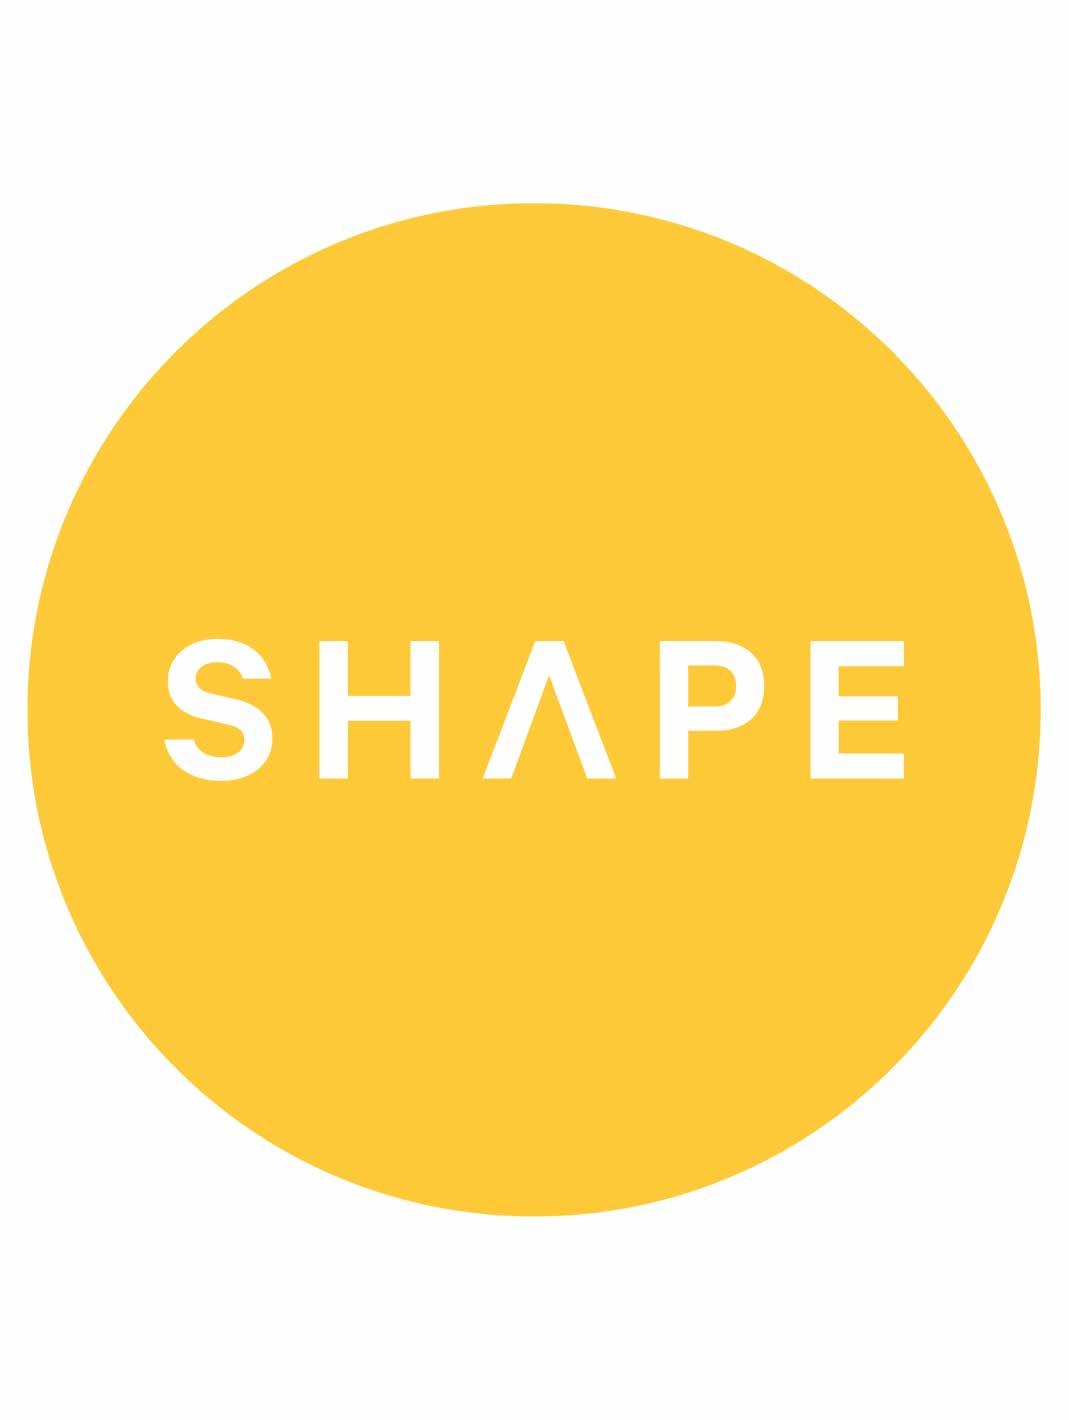 SHAPE_YELLOW thumb